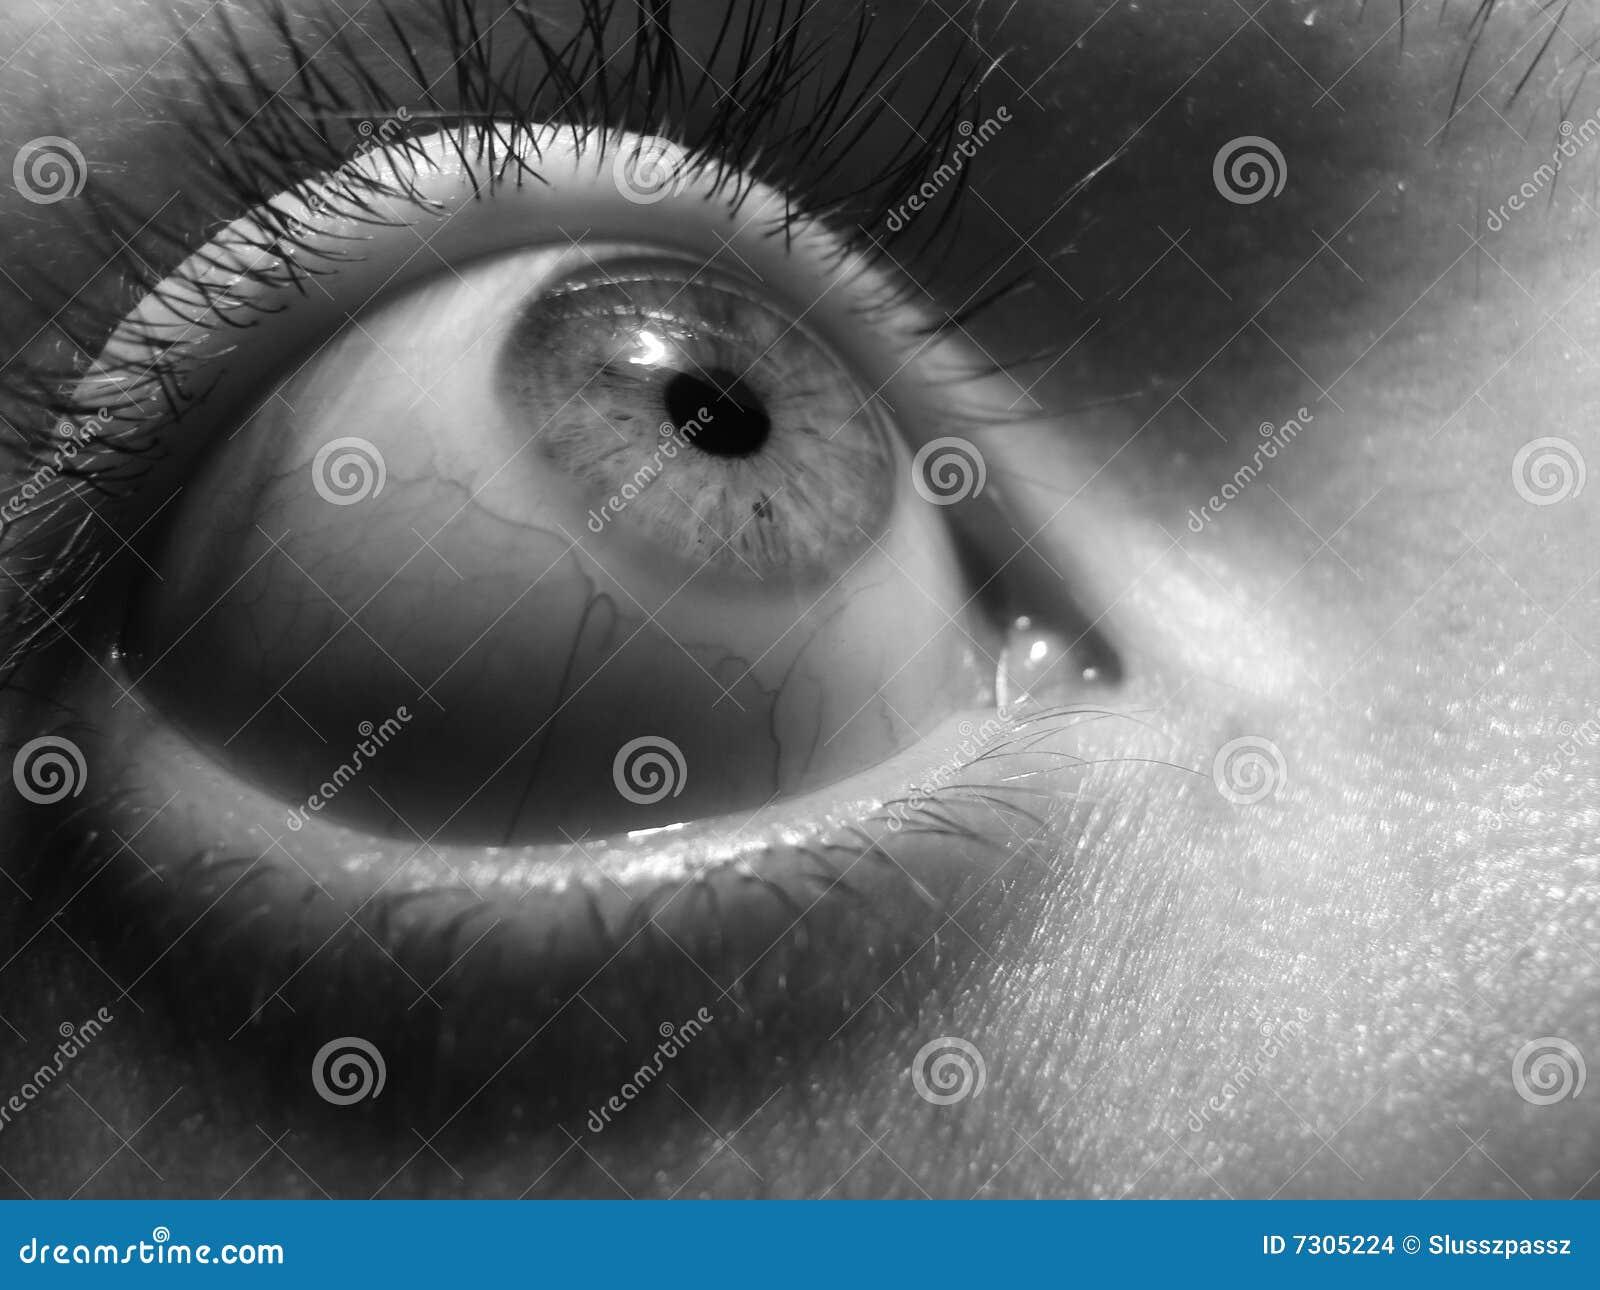 Eye fear